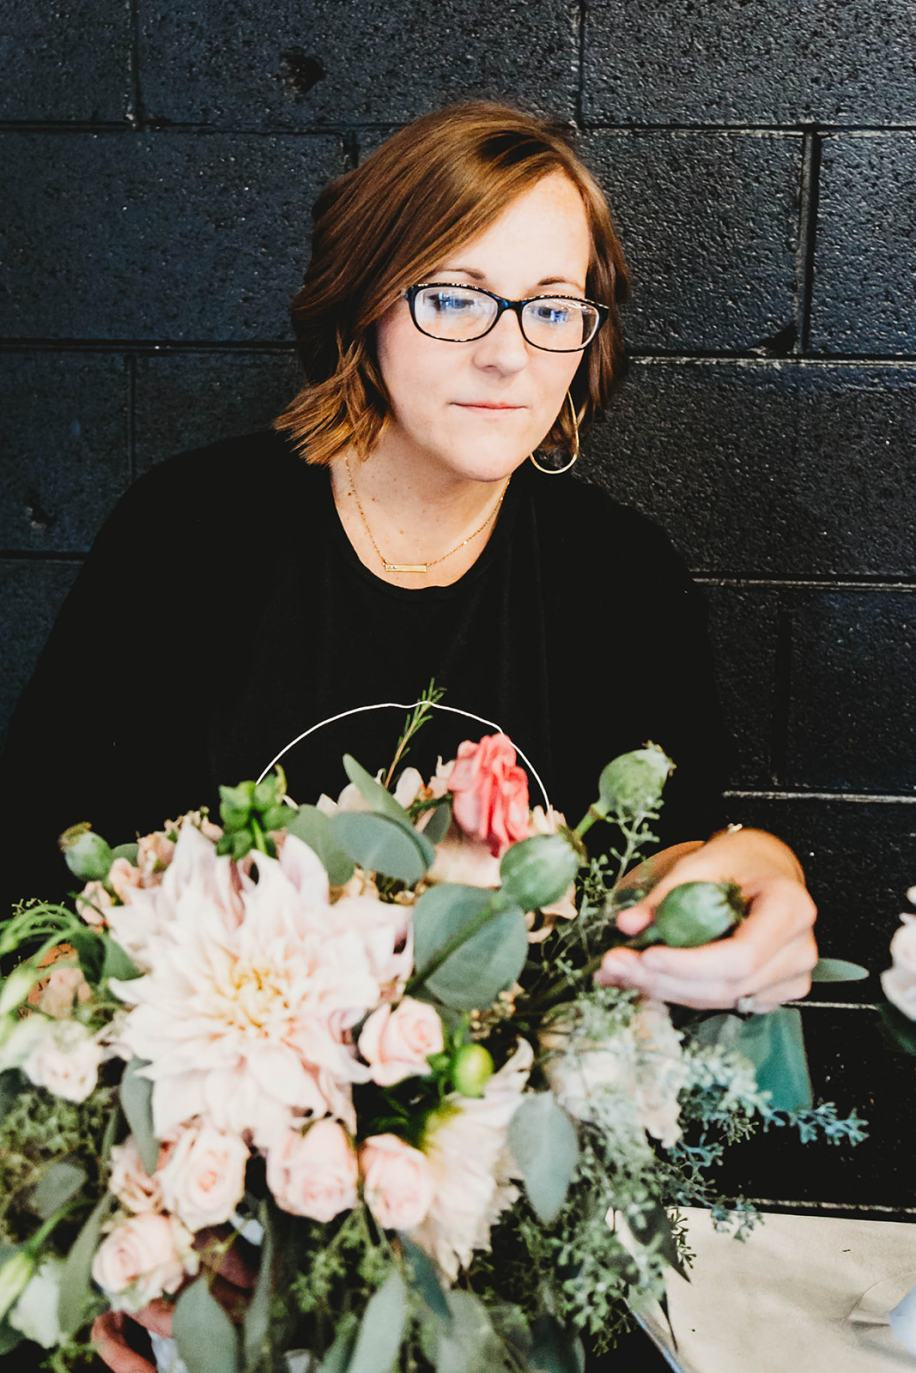 Stephanie_Lang_Lang_Floral_Designs_Best_Chattanooga_Wedding_Florist_15